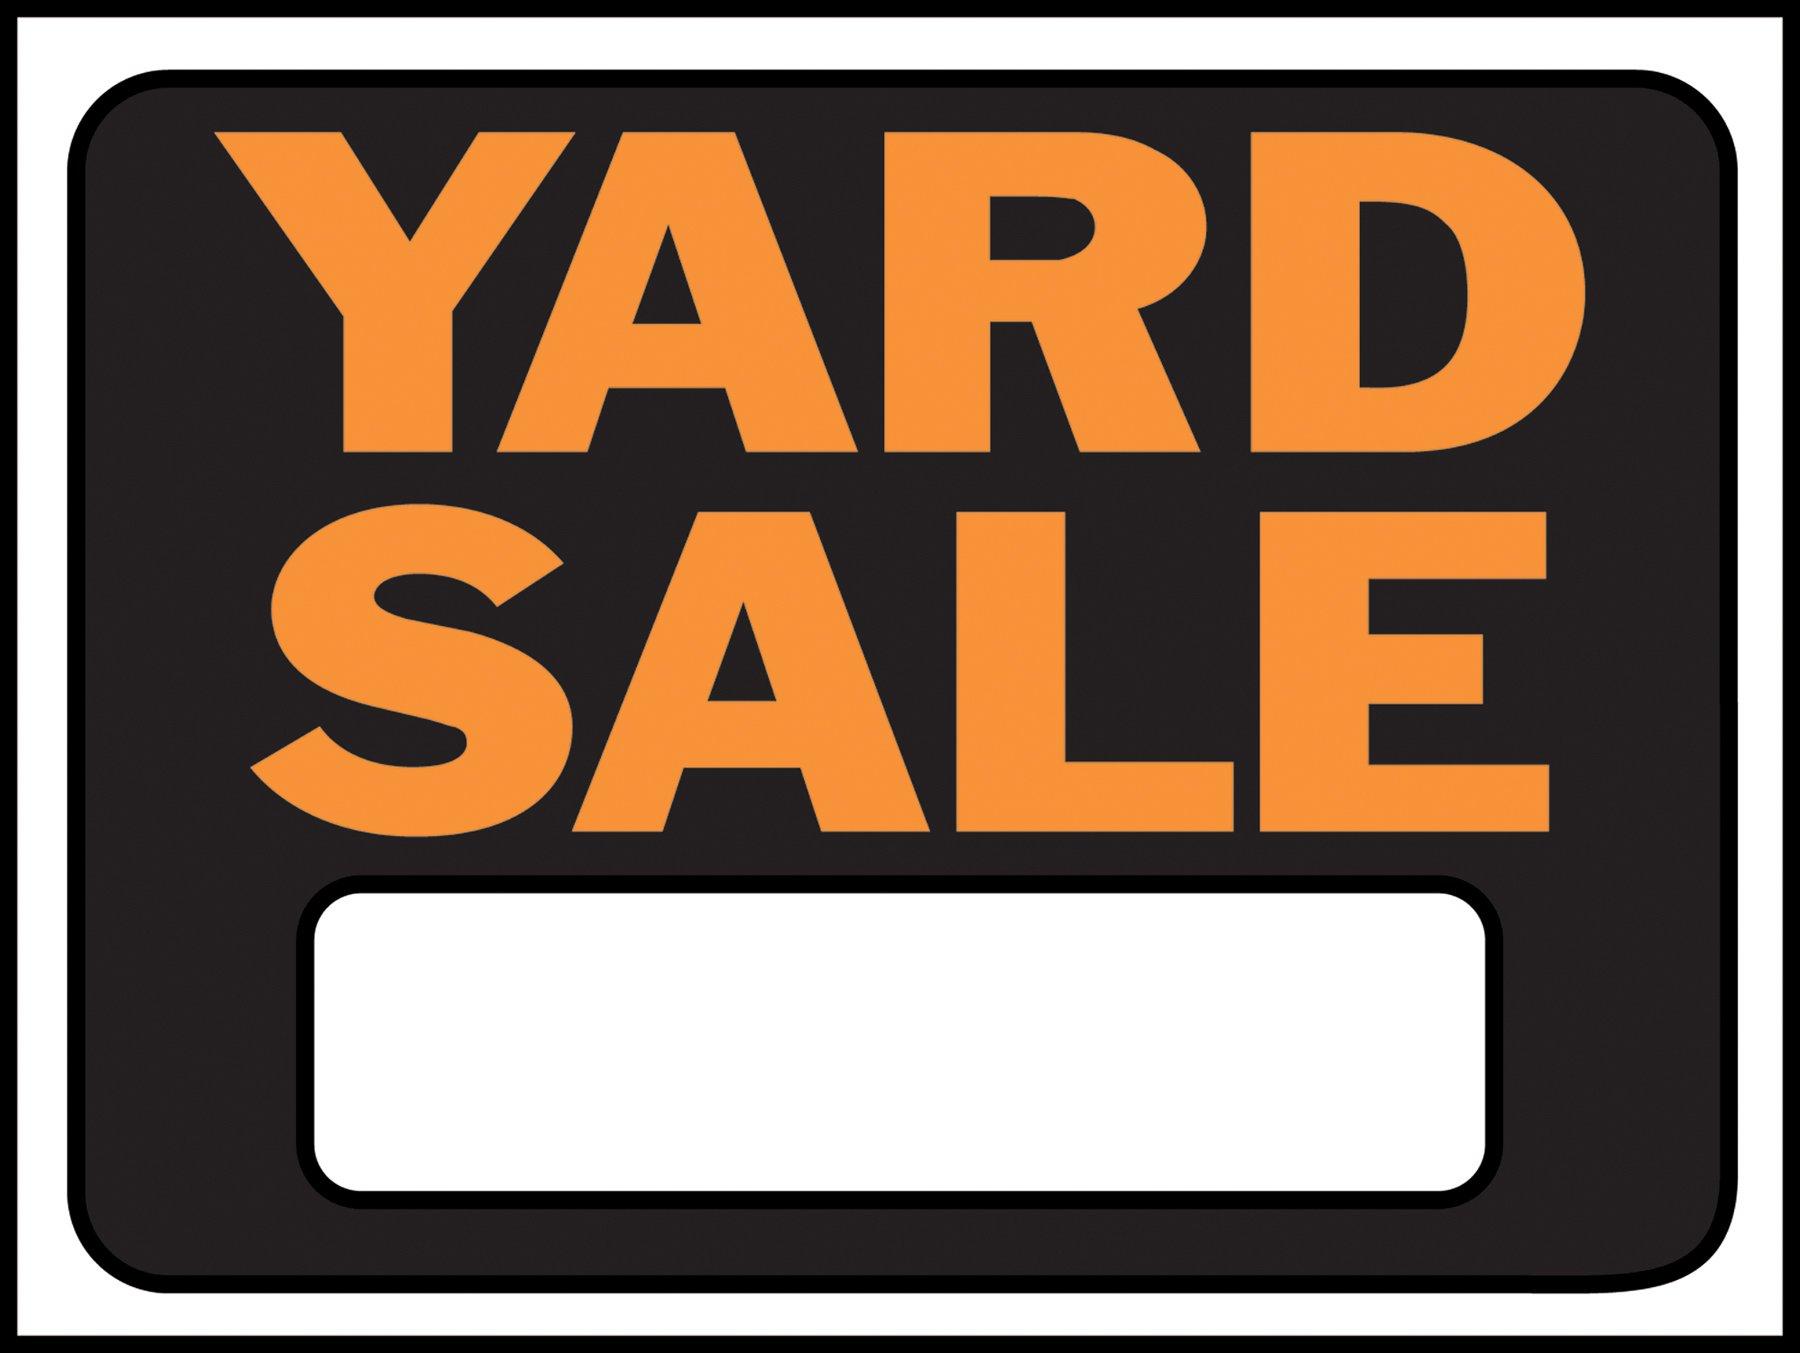 "Hy-Ko Products 3033 Yard Sale Plastic Sign 8.5"" x 12"" Orange/Black, 1 Piece"